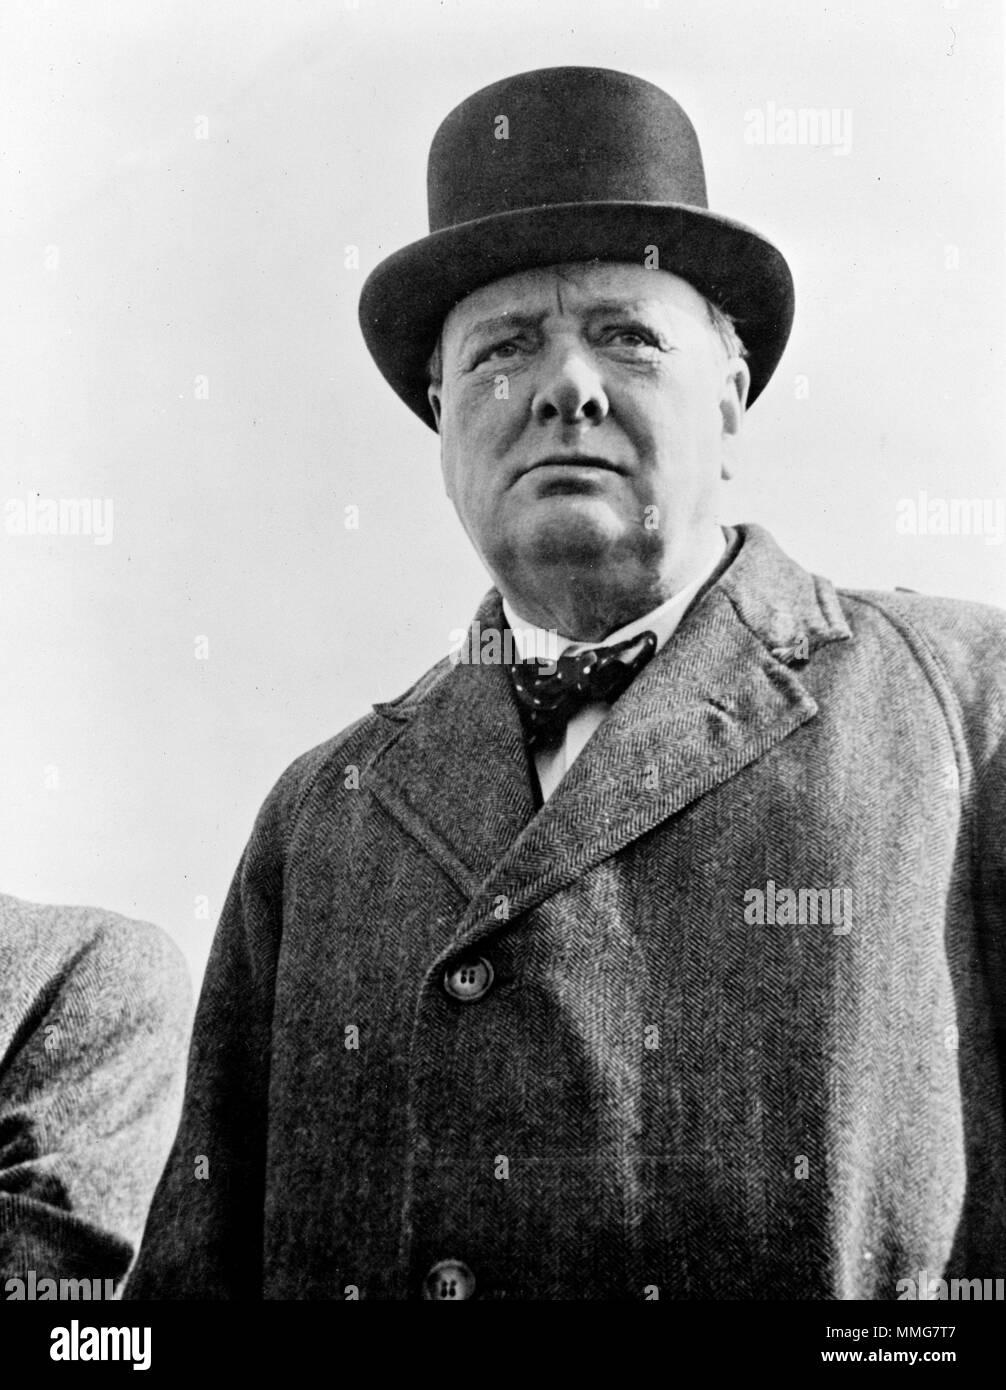 Prime Minister Winston Churchill of Great Britain - Stock Image